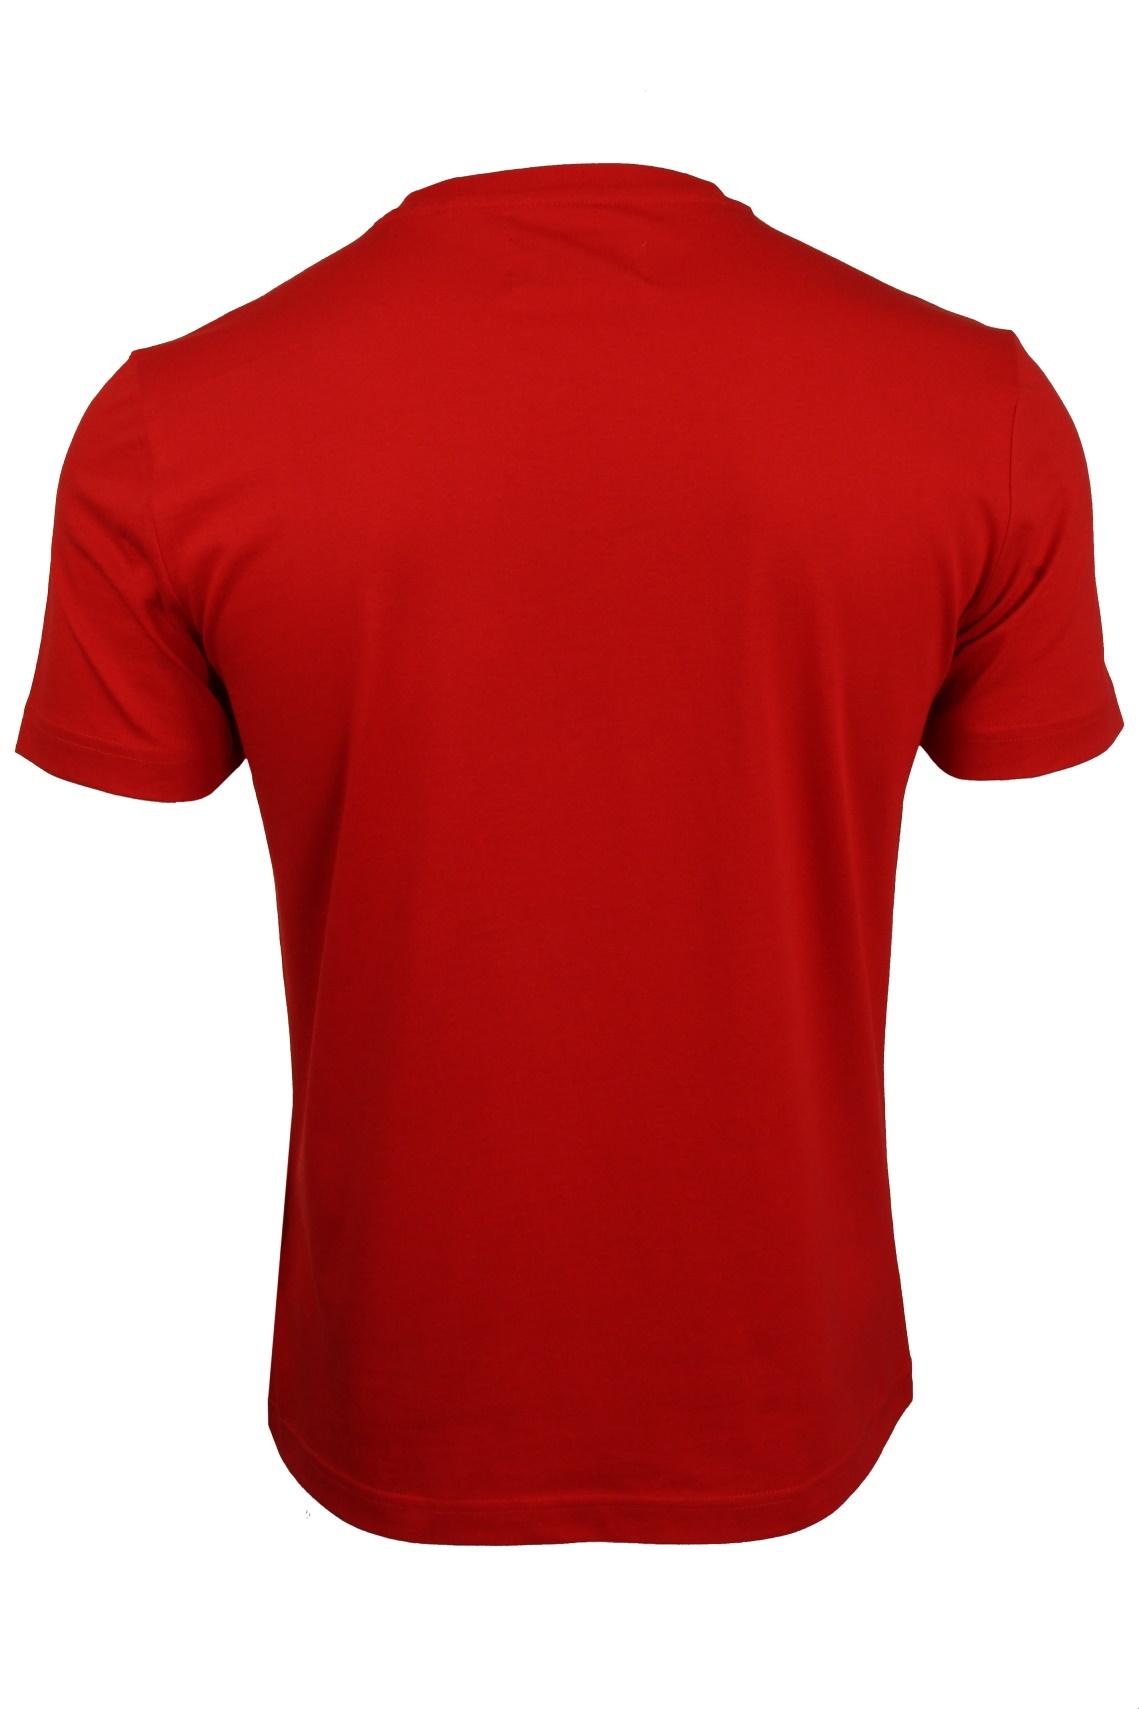 Mens-T-Shirt-by-Original-Penguin-Crew-Neck-Short-Sleeved thumbnail 26